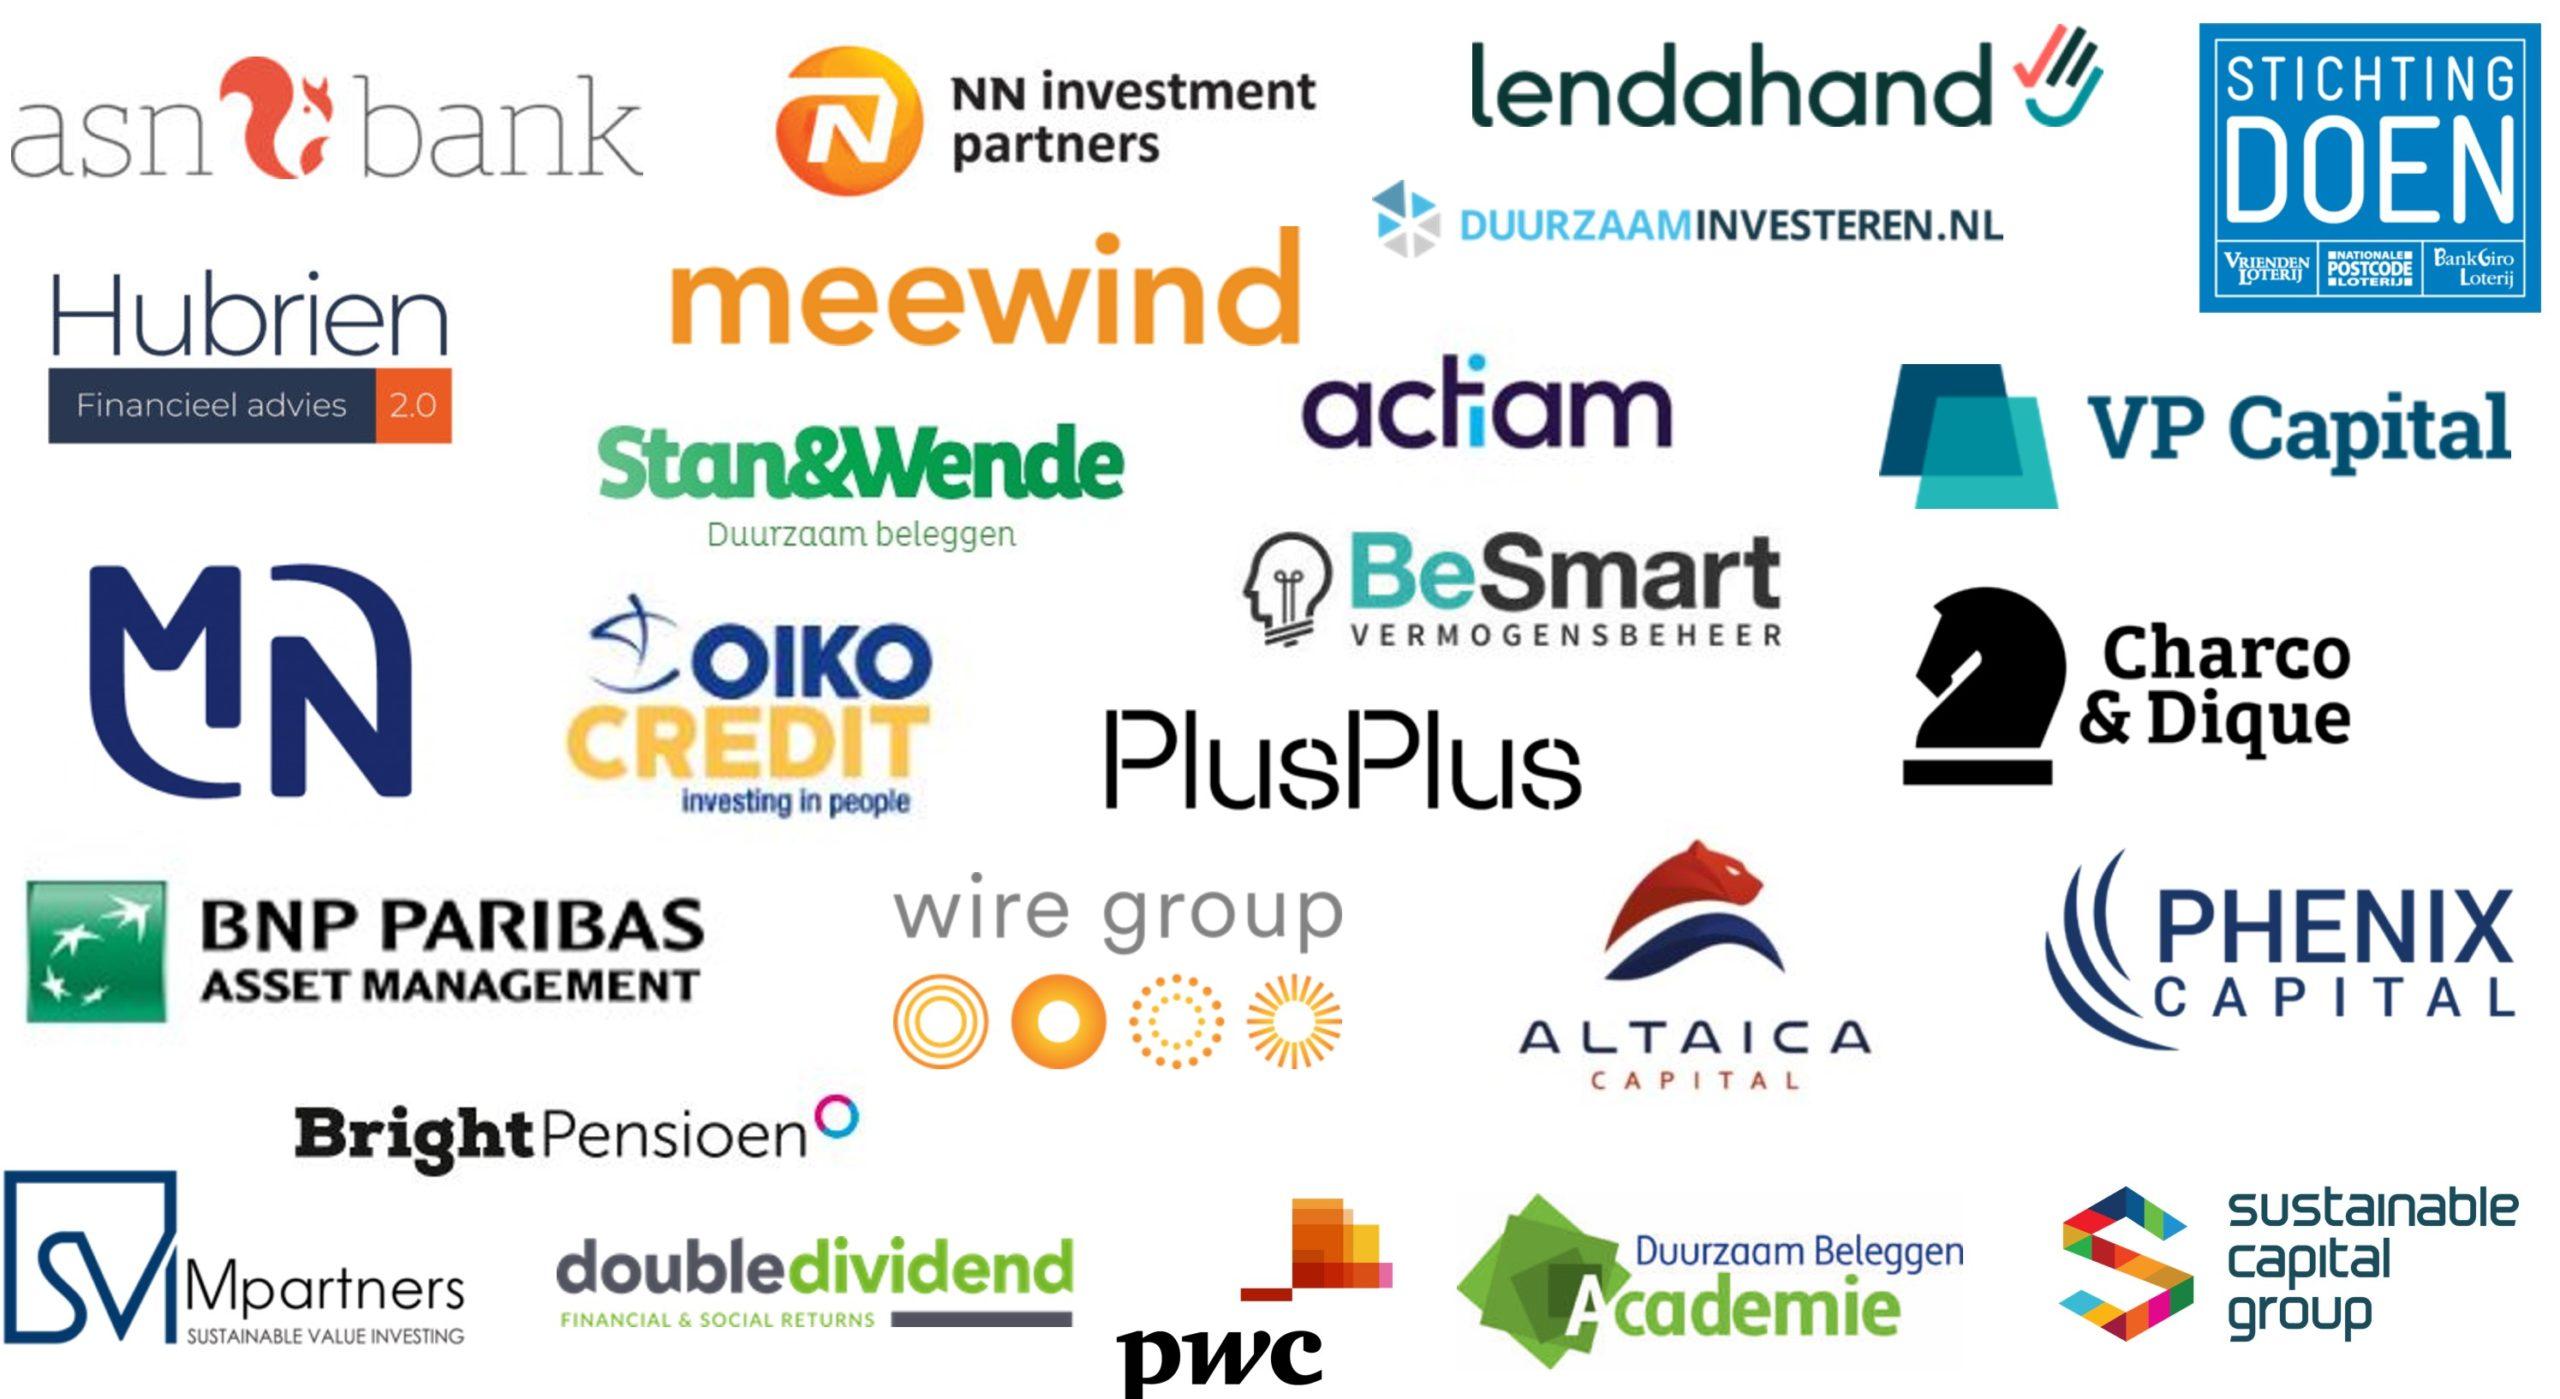 Sustainable Capital Group 25ste partner van Portaal Financieel